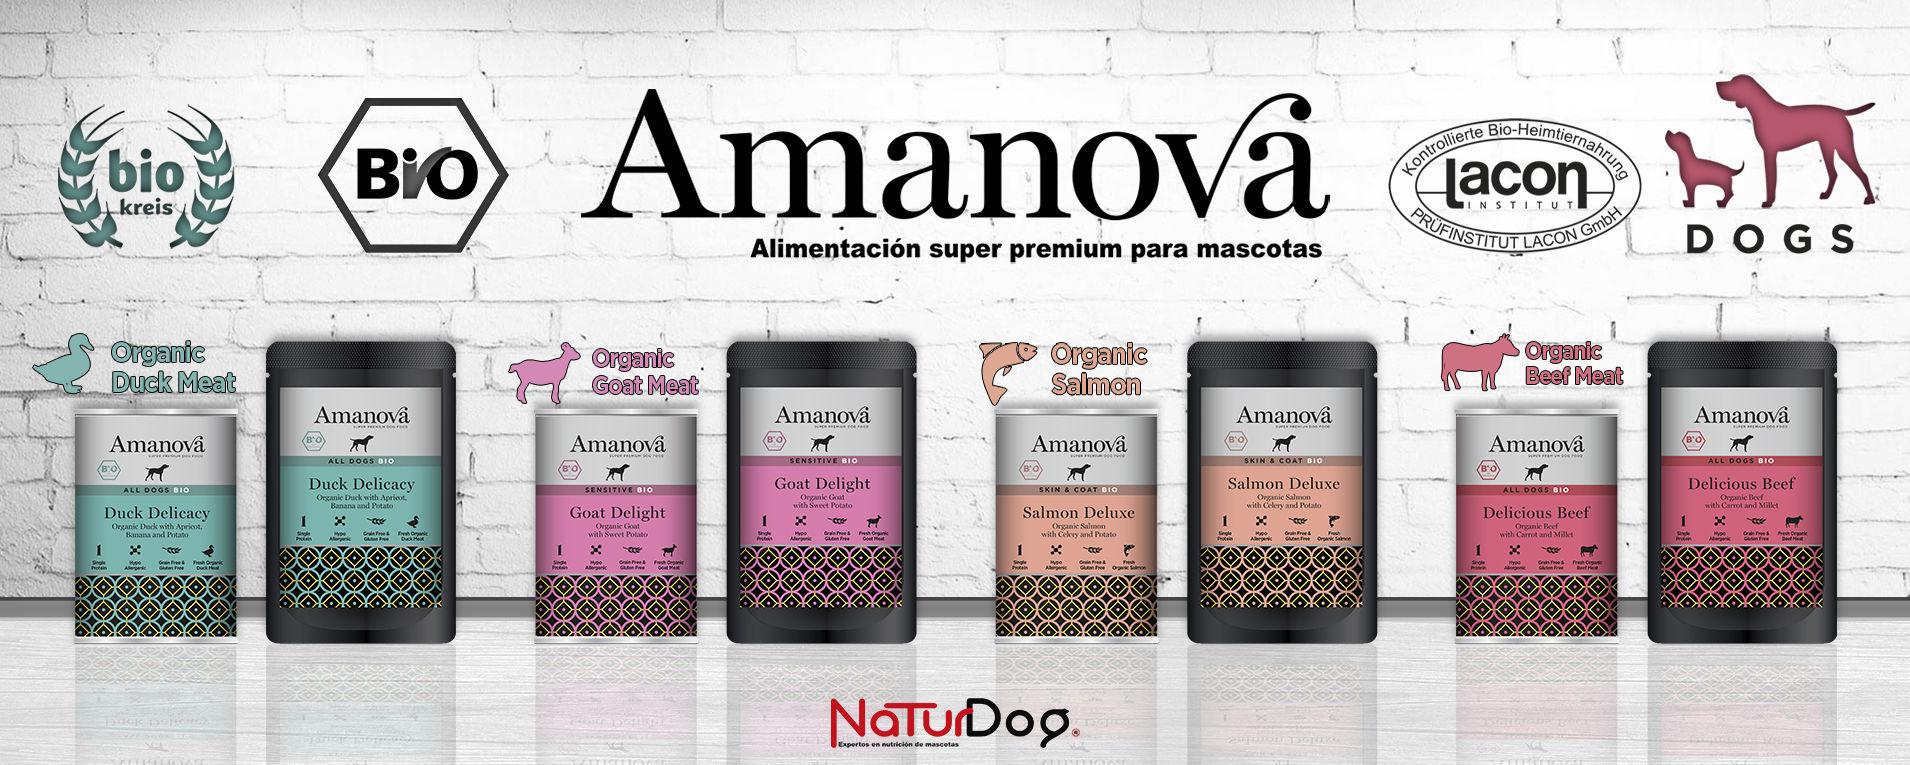 Amanova bio alimentacion natural NaturDog 2017?1.1.2